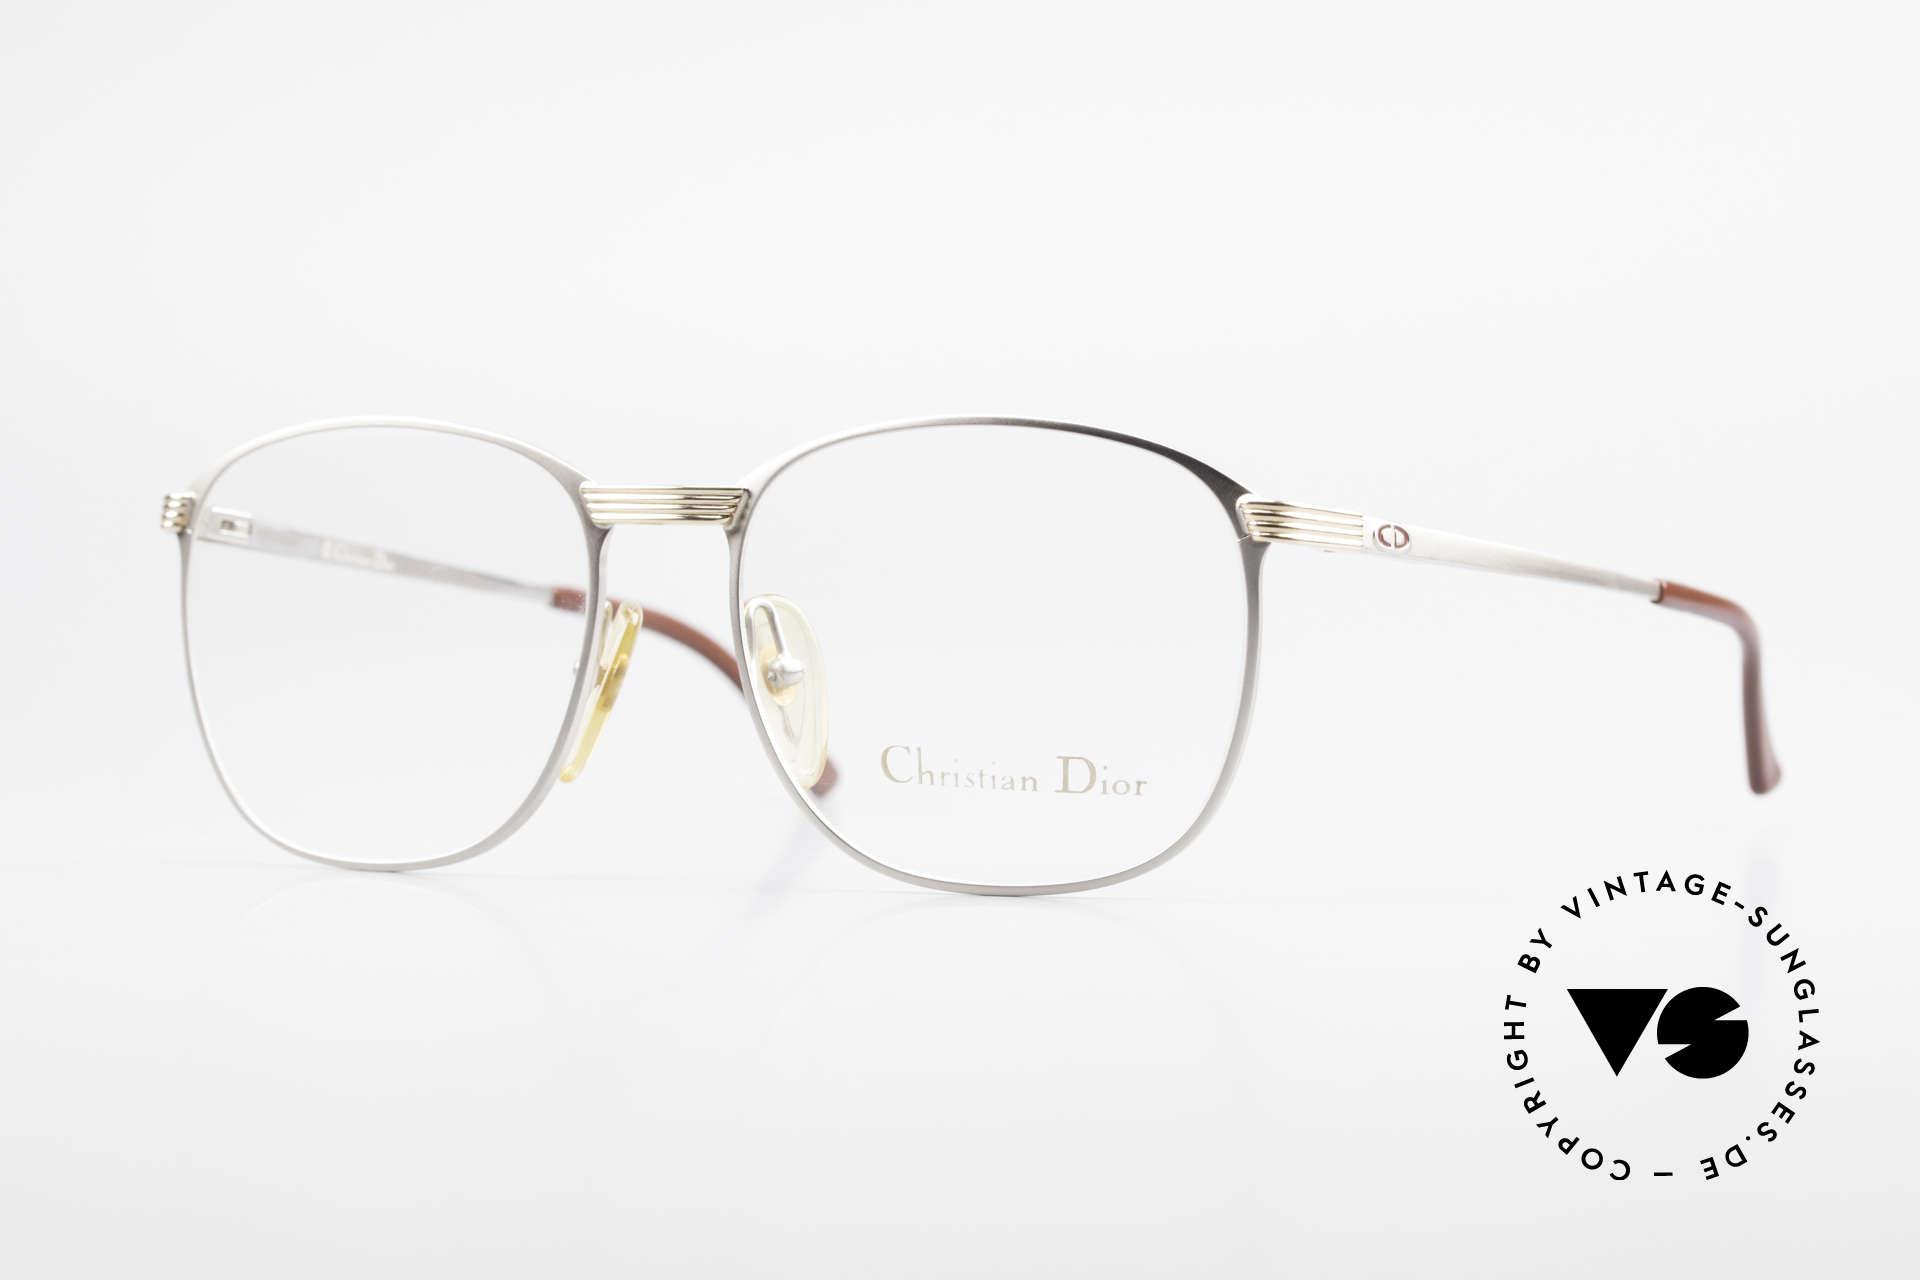 Christian Dior 2721 1980's Titanium Frame Men, classic 80's vintage eyeglass-frame by Christian Dior, Made for Men